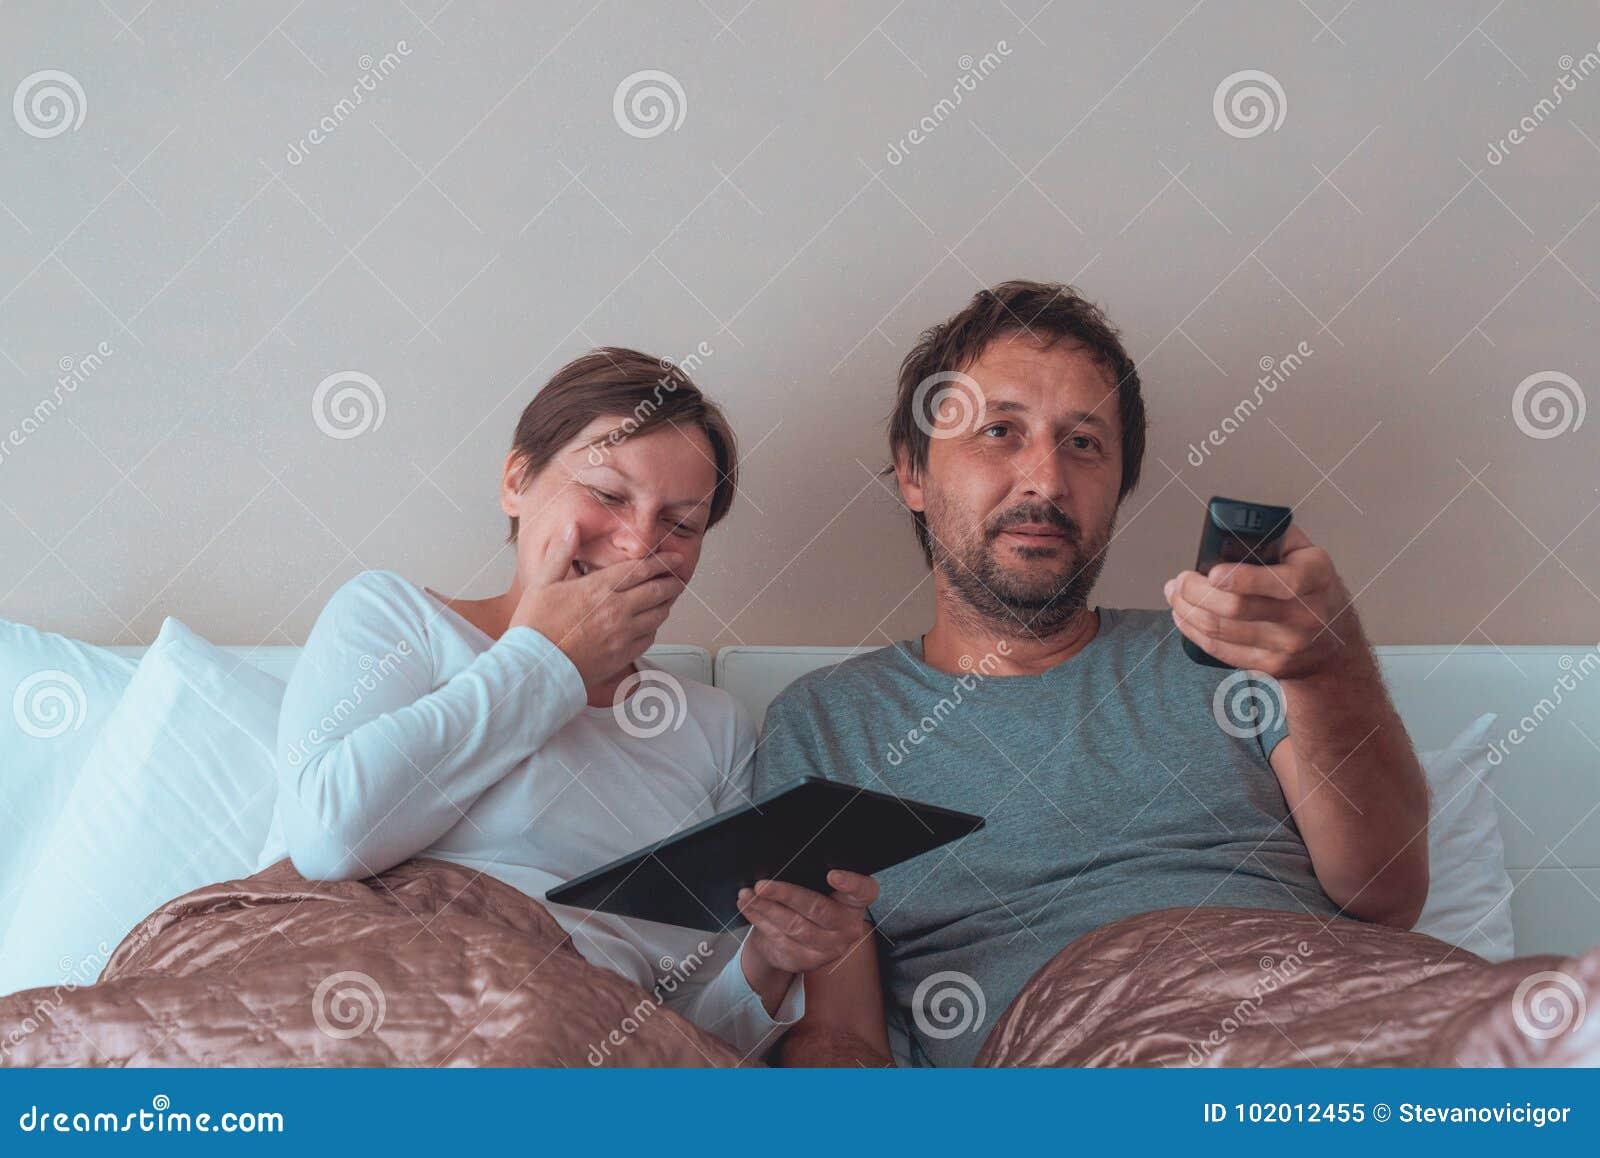 Супруги в спальне онлайн